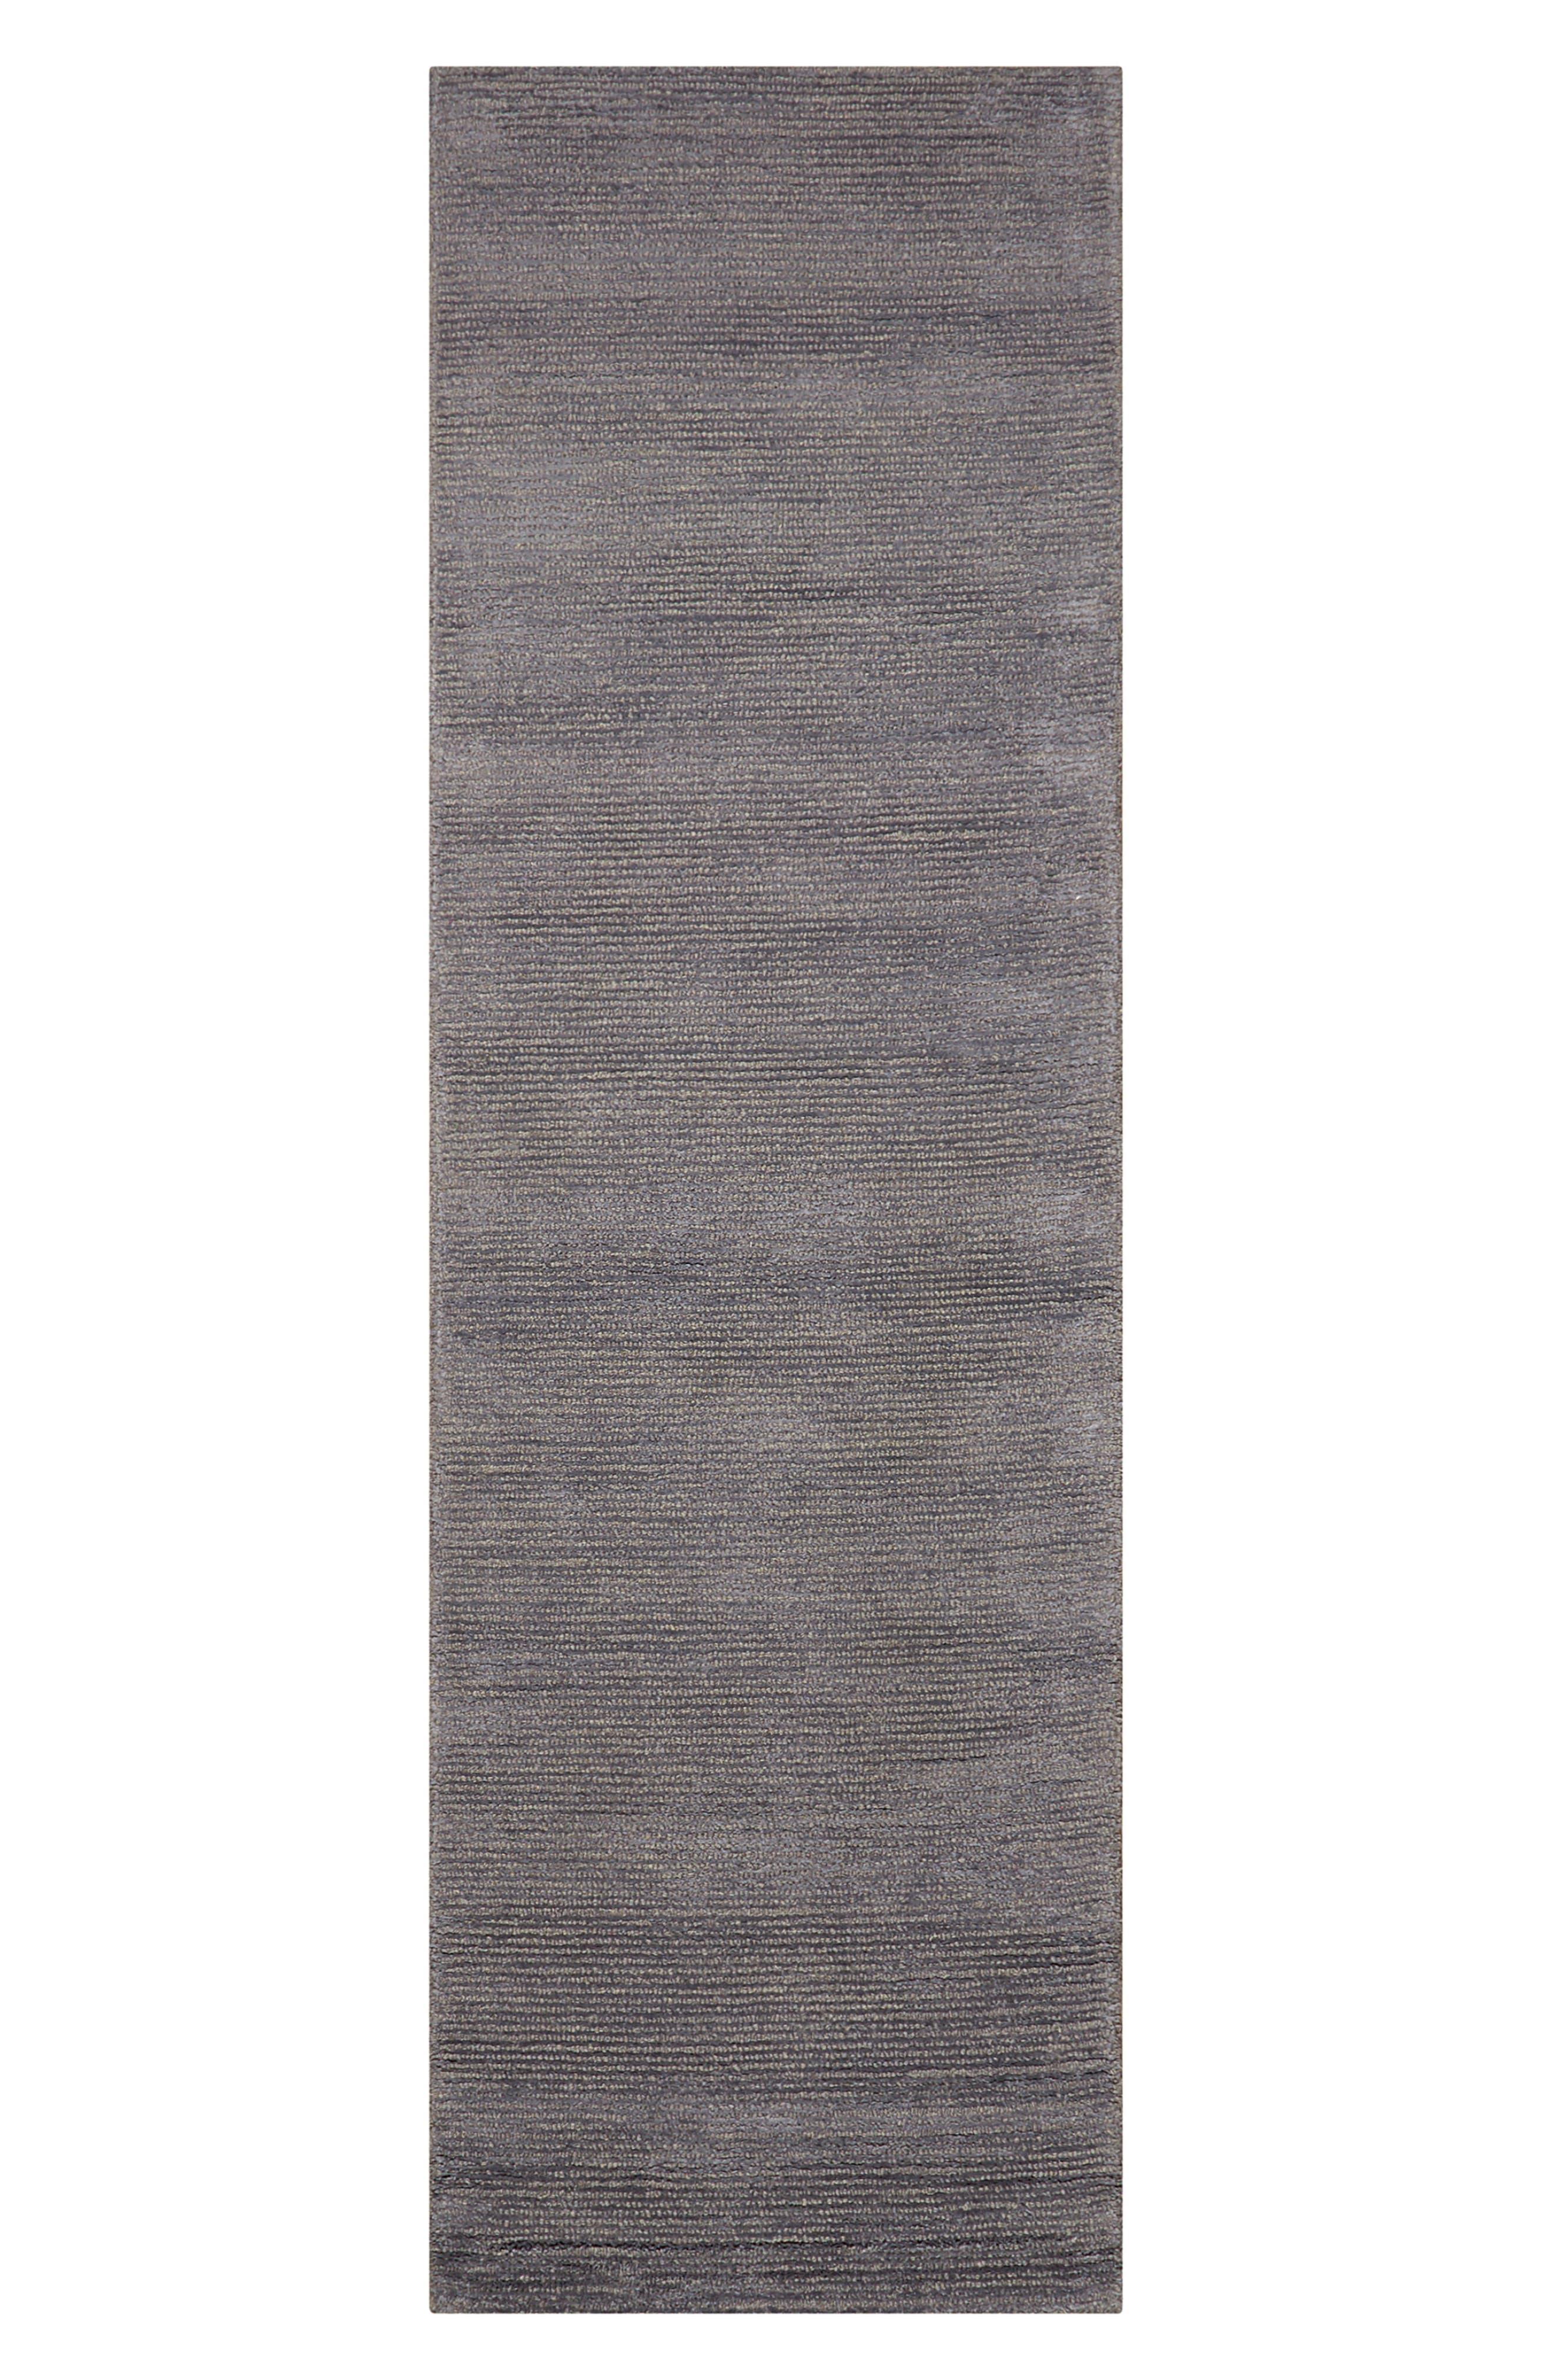 Ravine Furrow Handwoven Area Rug,                             Alternate thumbnail 2, color,                             Dusk